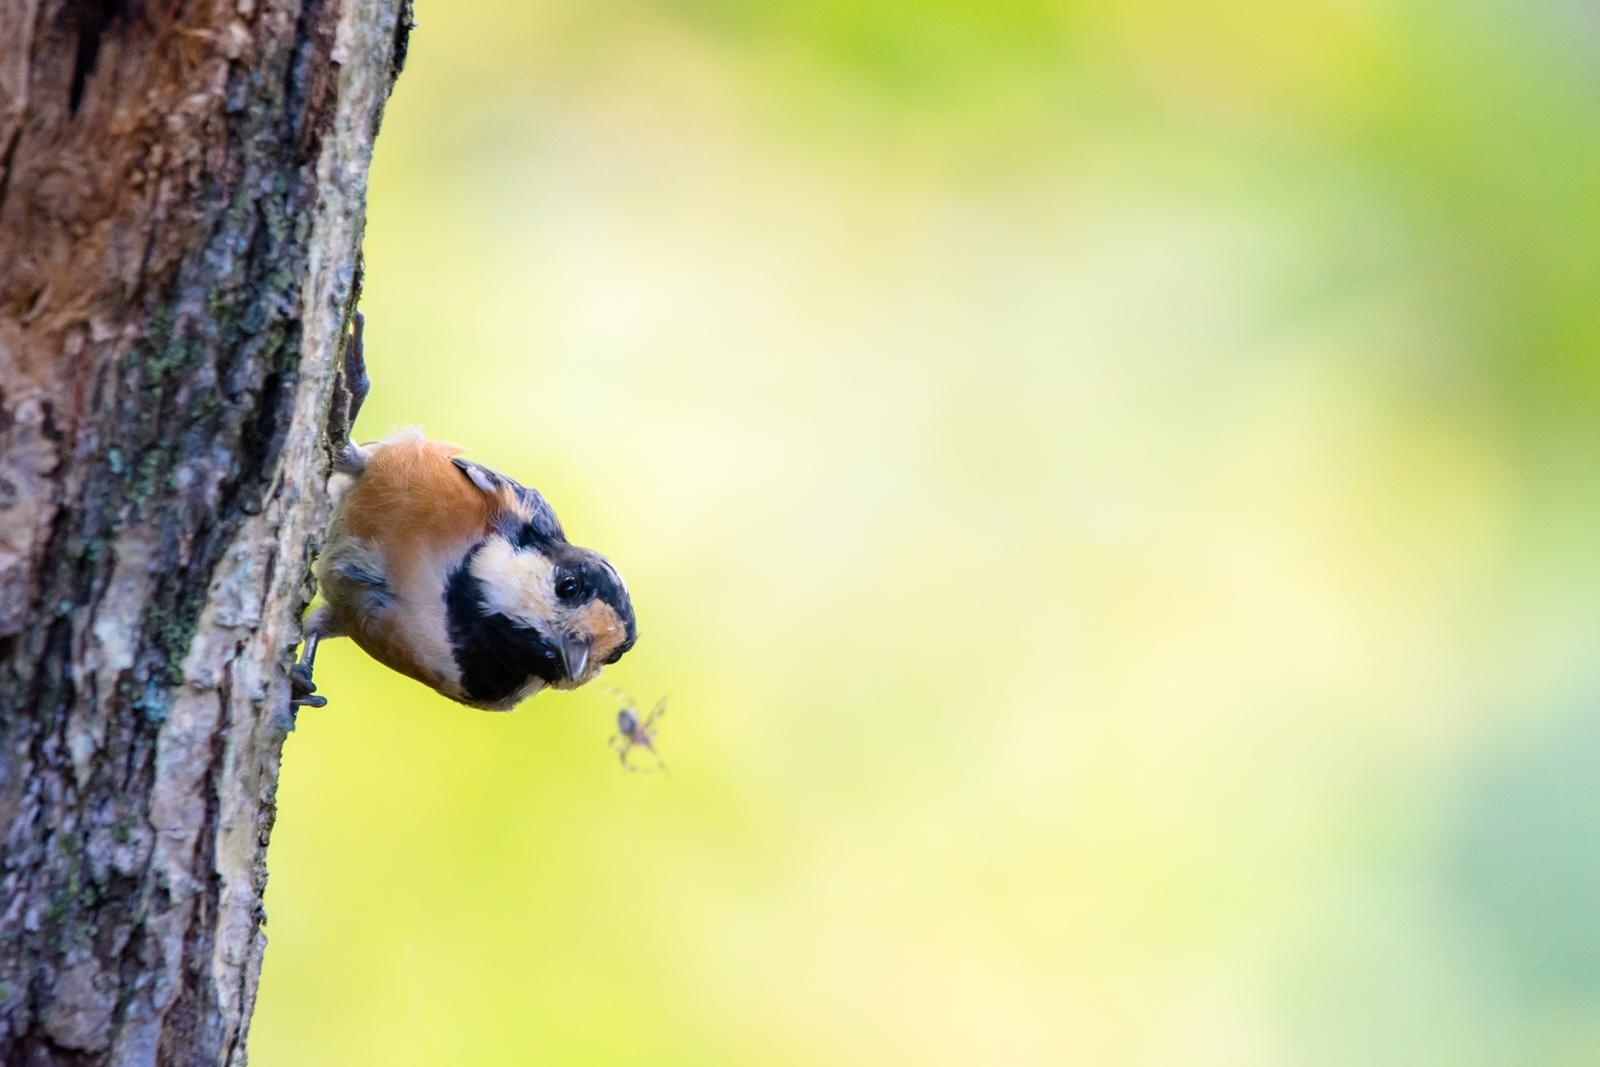 Photo: ロックオン Lock-on.  目の前の獲物に瞳をキラキラ わくわく高鳴る気持ち そんなキミを見て 僕もわくわくどきどき  Varied tit. (ヤマガラ)  #birdphotography #birds #cooljapan #kawaii #nikon #sigma  Nikon D7200 SIGMA 150-600mm F5-6.3 DG OS HSM Contemporary